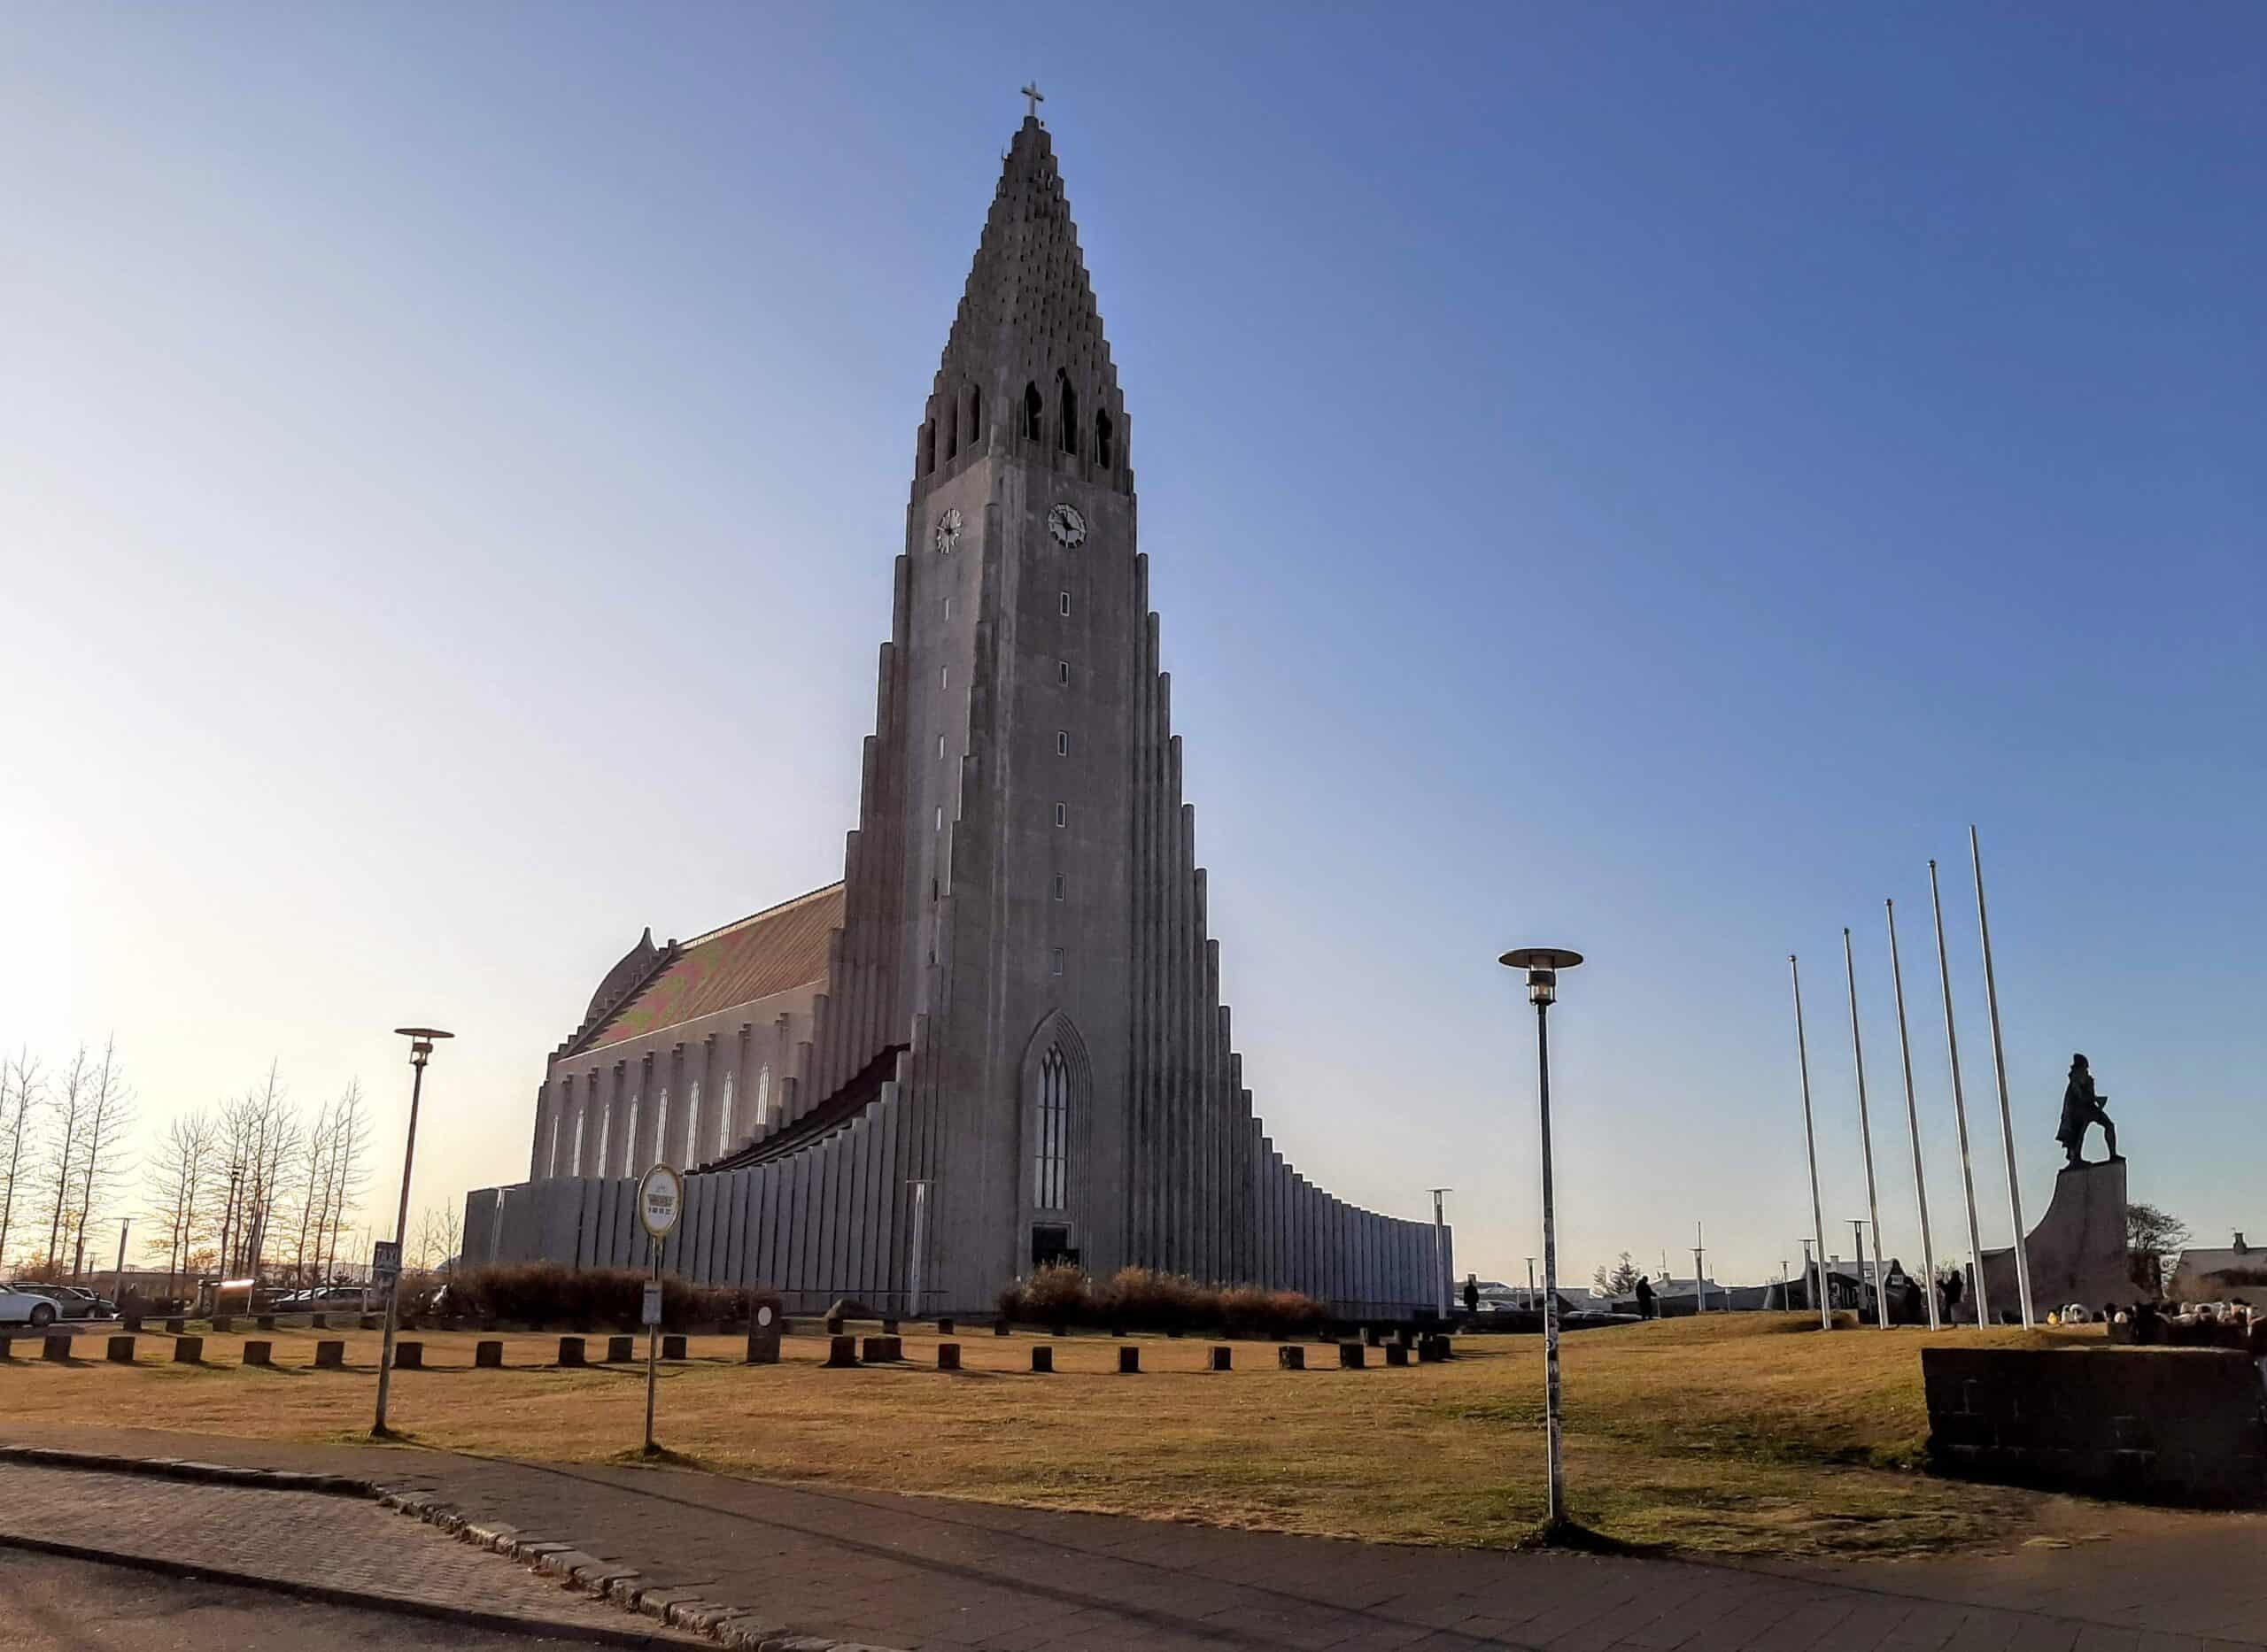 Reykjavik Mixedgrill